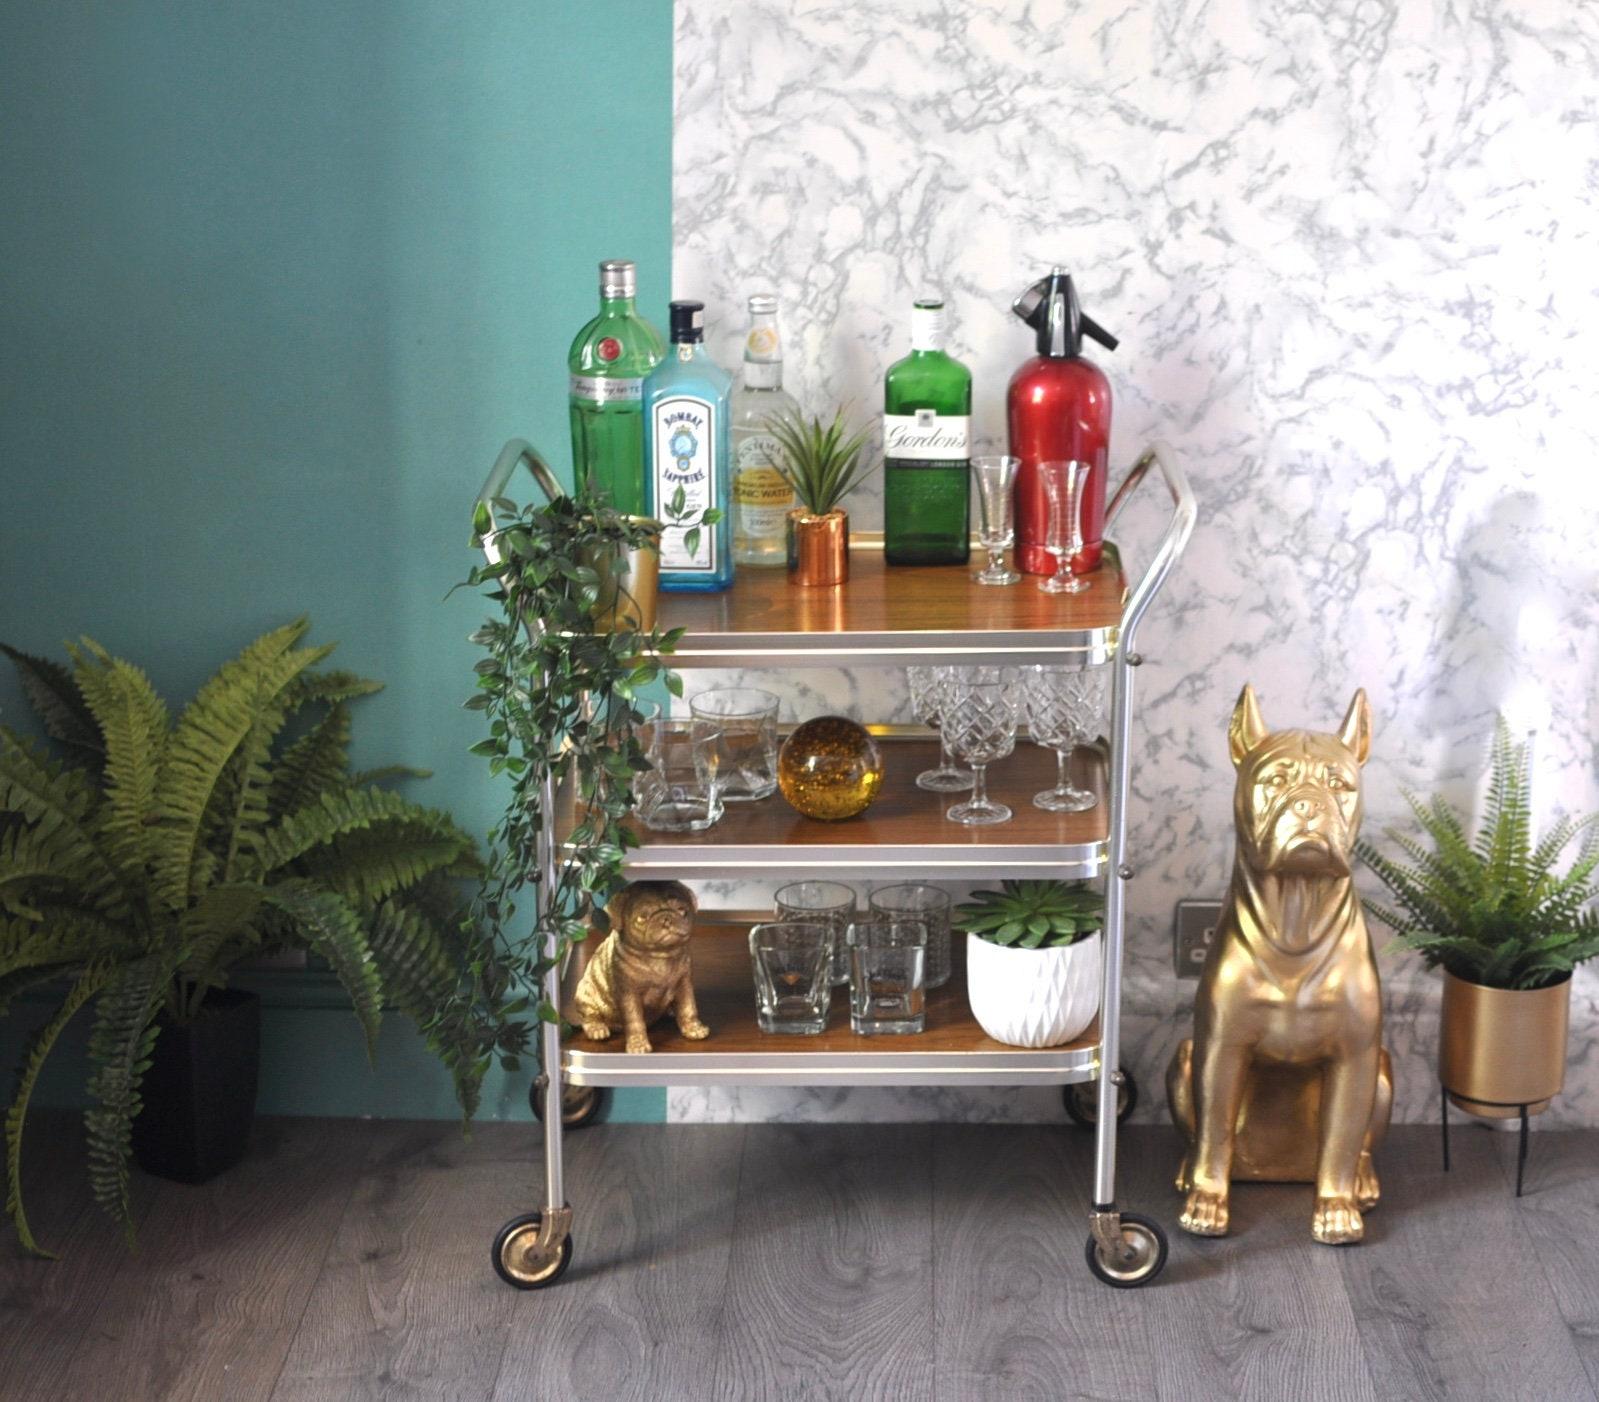 retro bar cart men's bar amazing vintage retro 1960s tier wood grain drinks cart bar tea trolley trolley